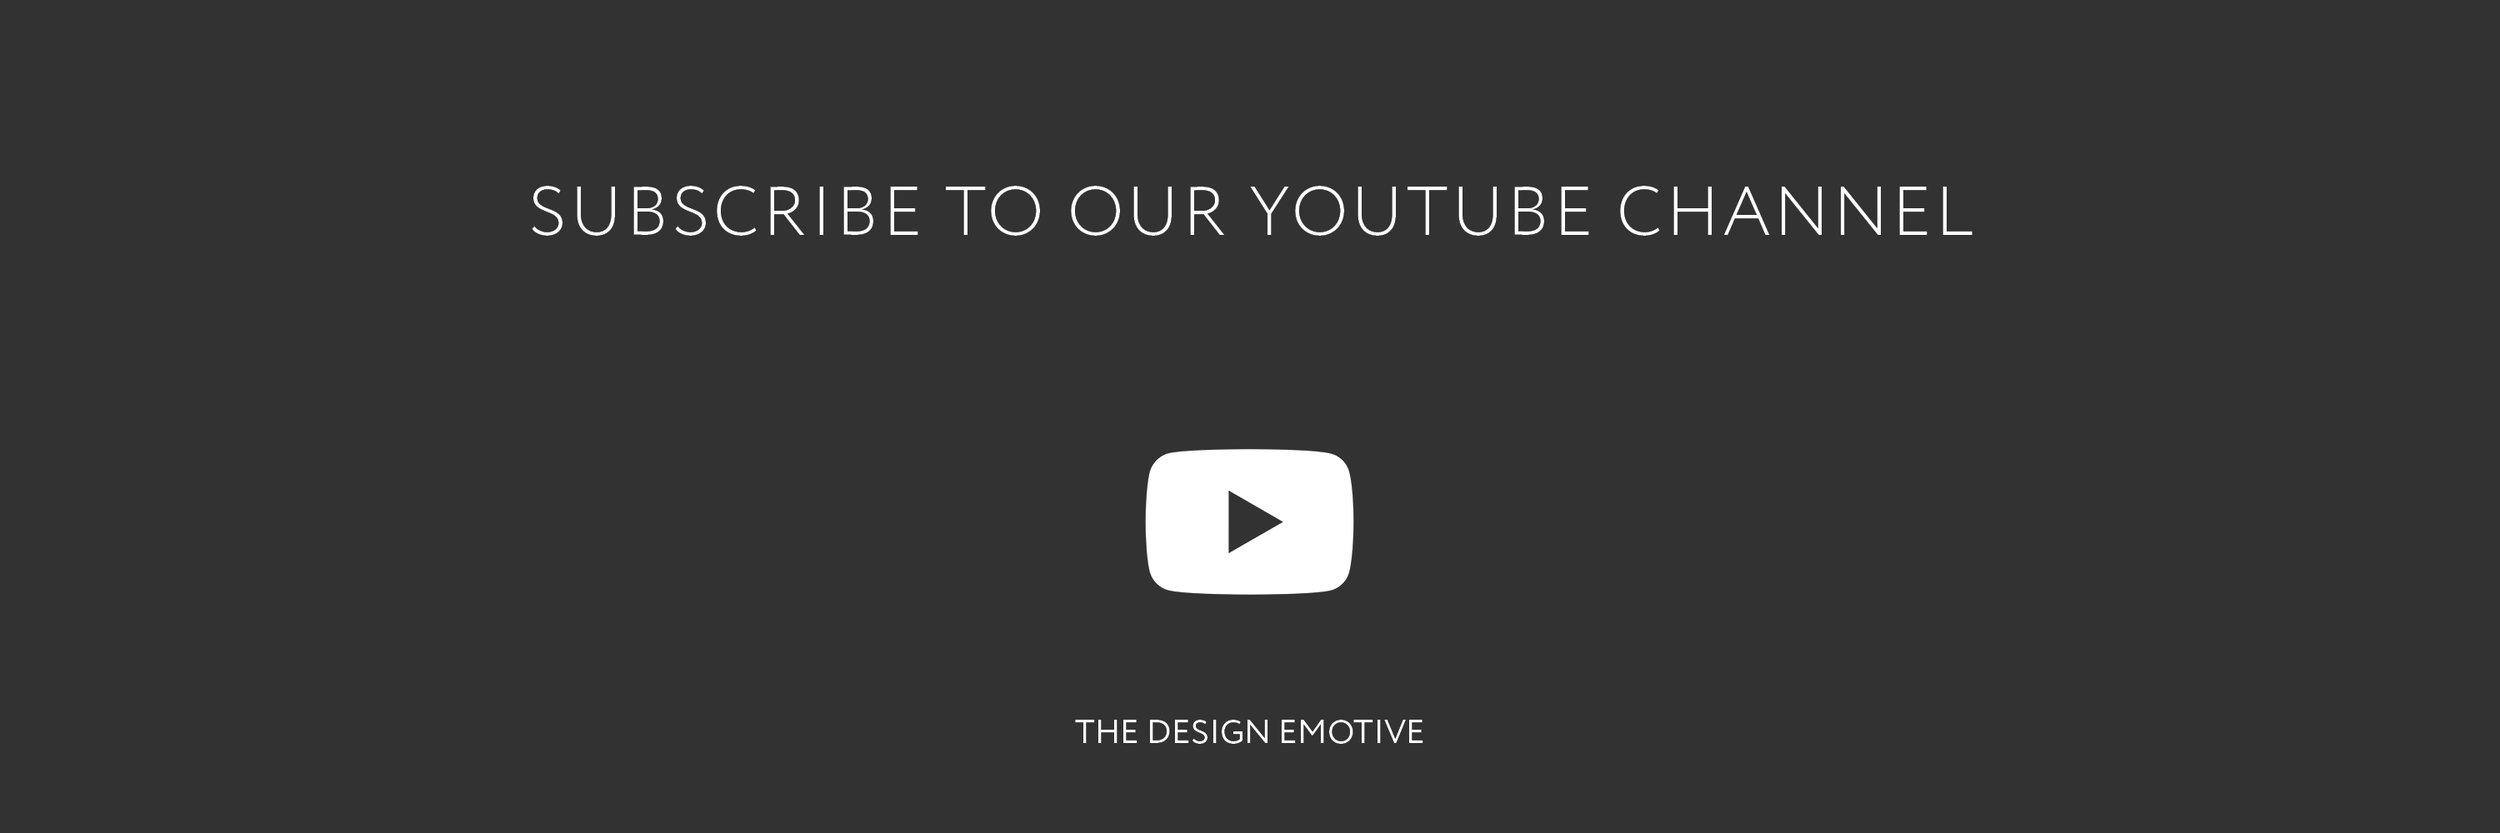 subscribe-youtube-banner-C.jpg